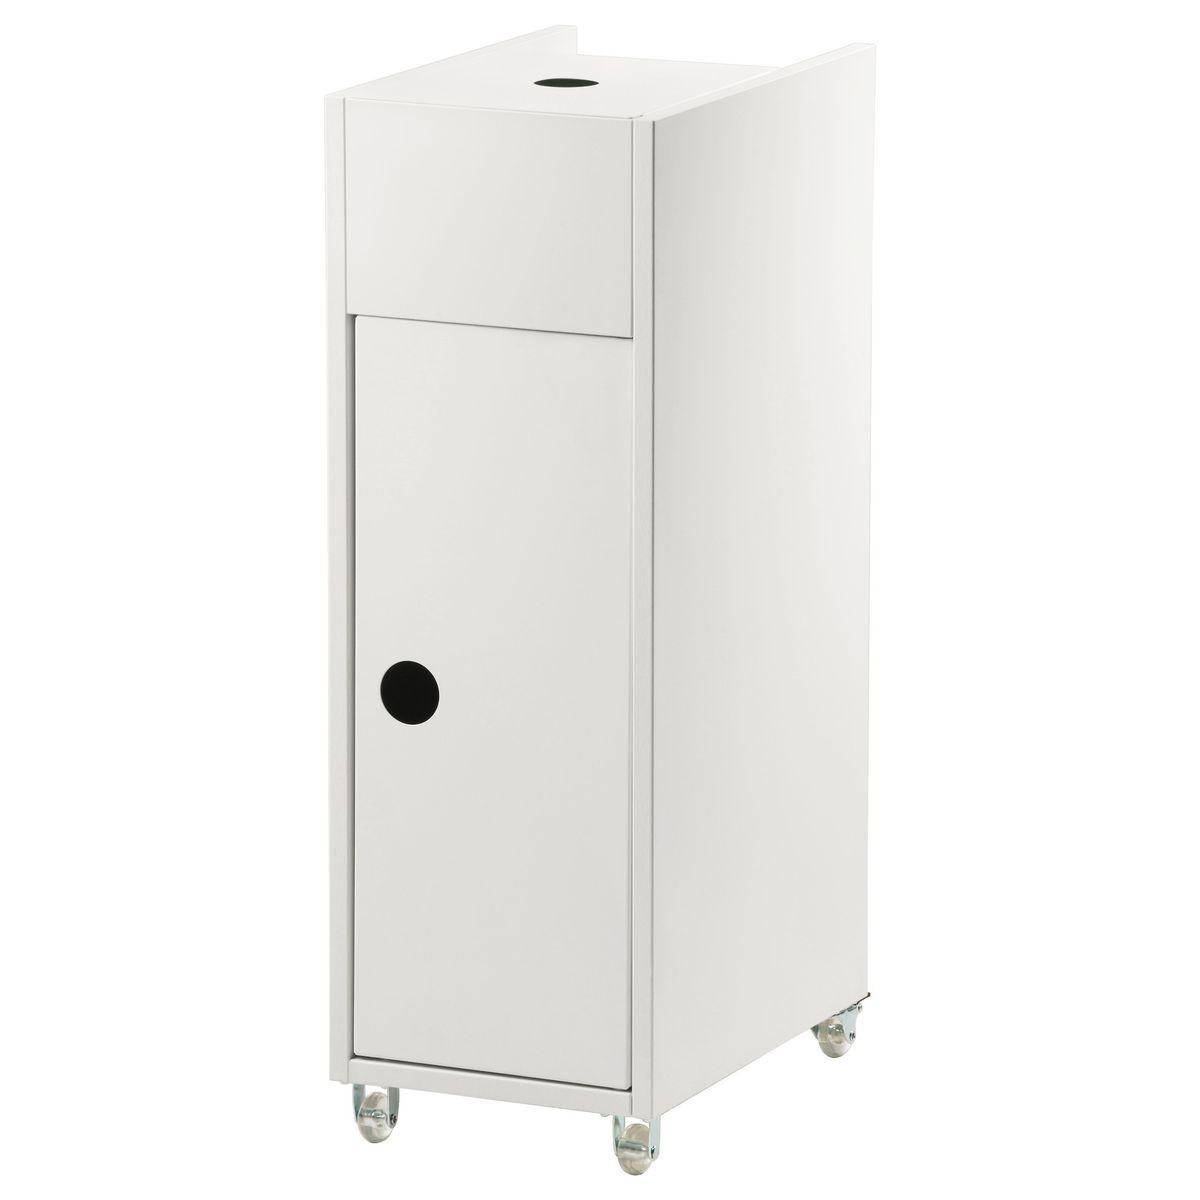 Ikea Badregal Weiß